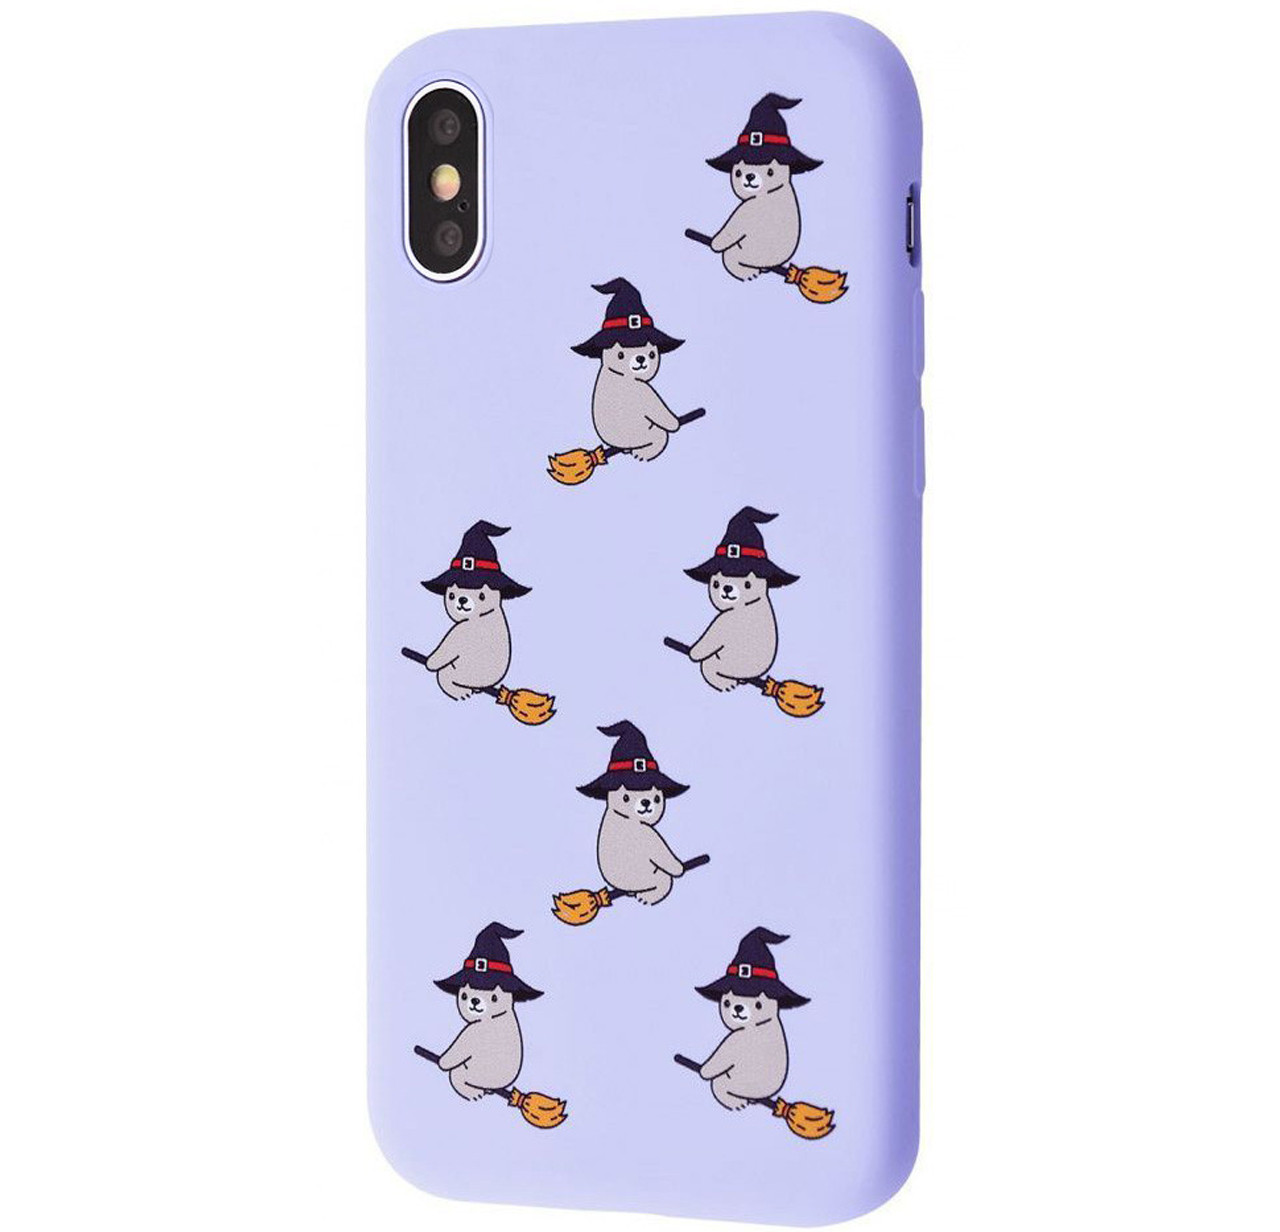 Чехол-накладка TPU WAVE Fancy Case для IPhone X / Xs Light Purple (Bear On Broom)